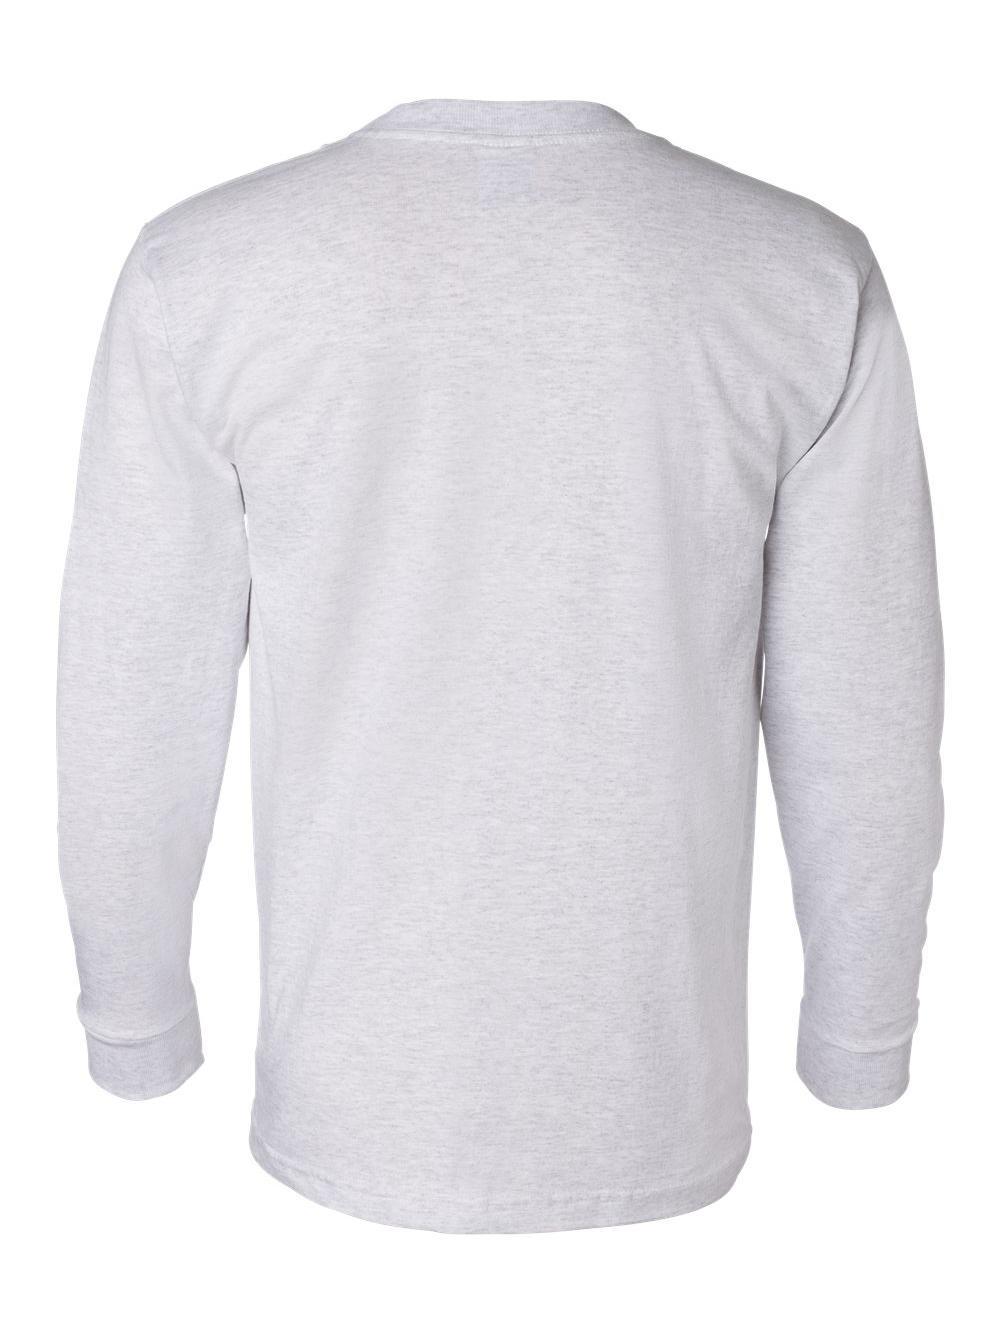 Bayside-USA-Made-Long-Sleeve-T-Shirt-with-a-Pocket-8100 thumbnail 4